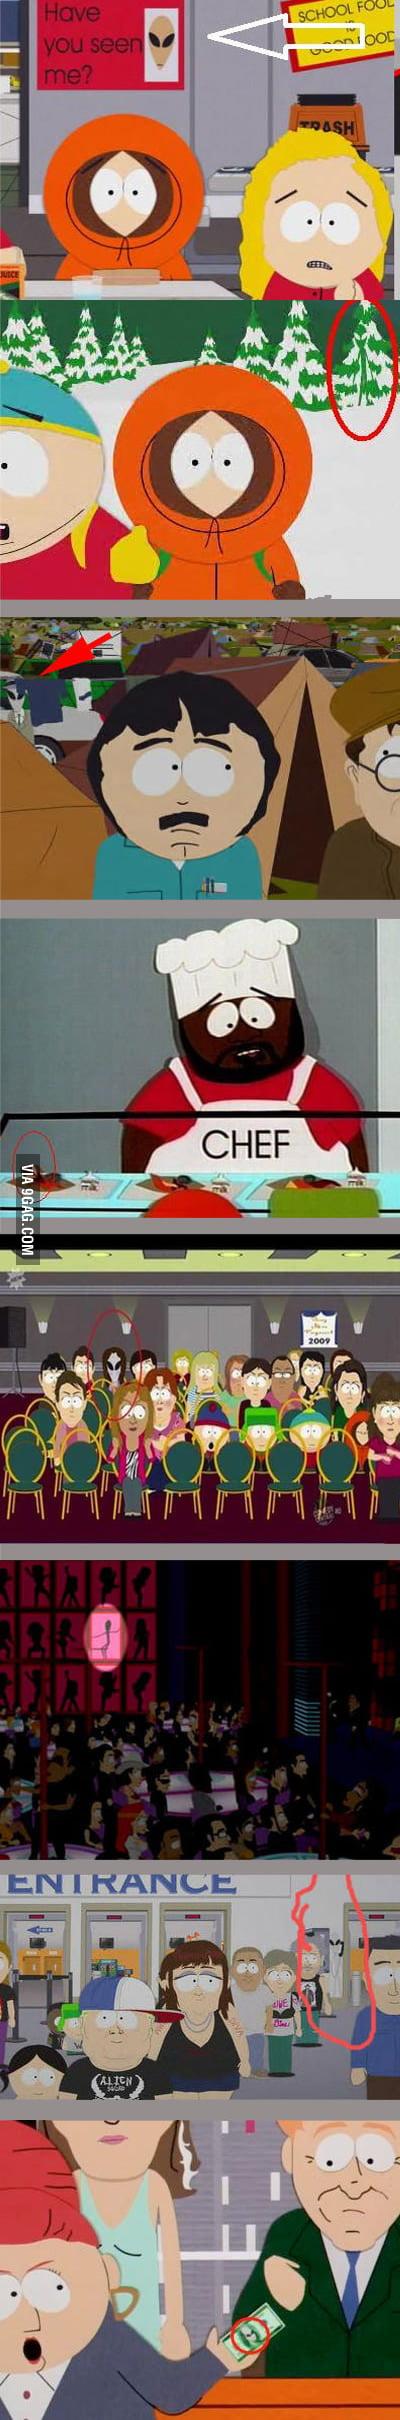 Hidden Aliens in South Park